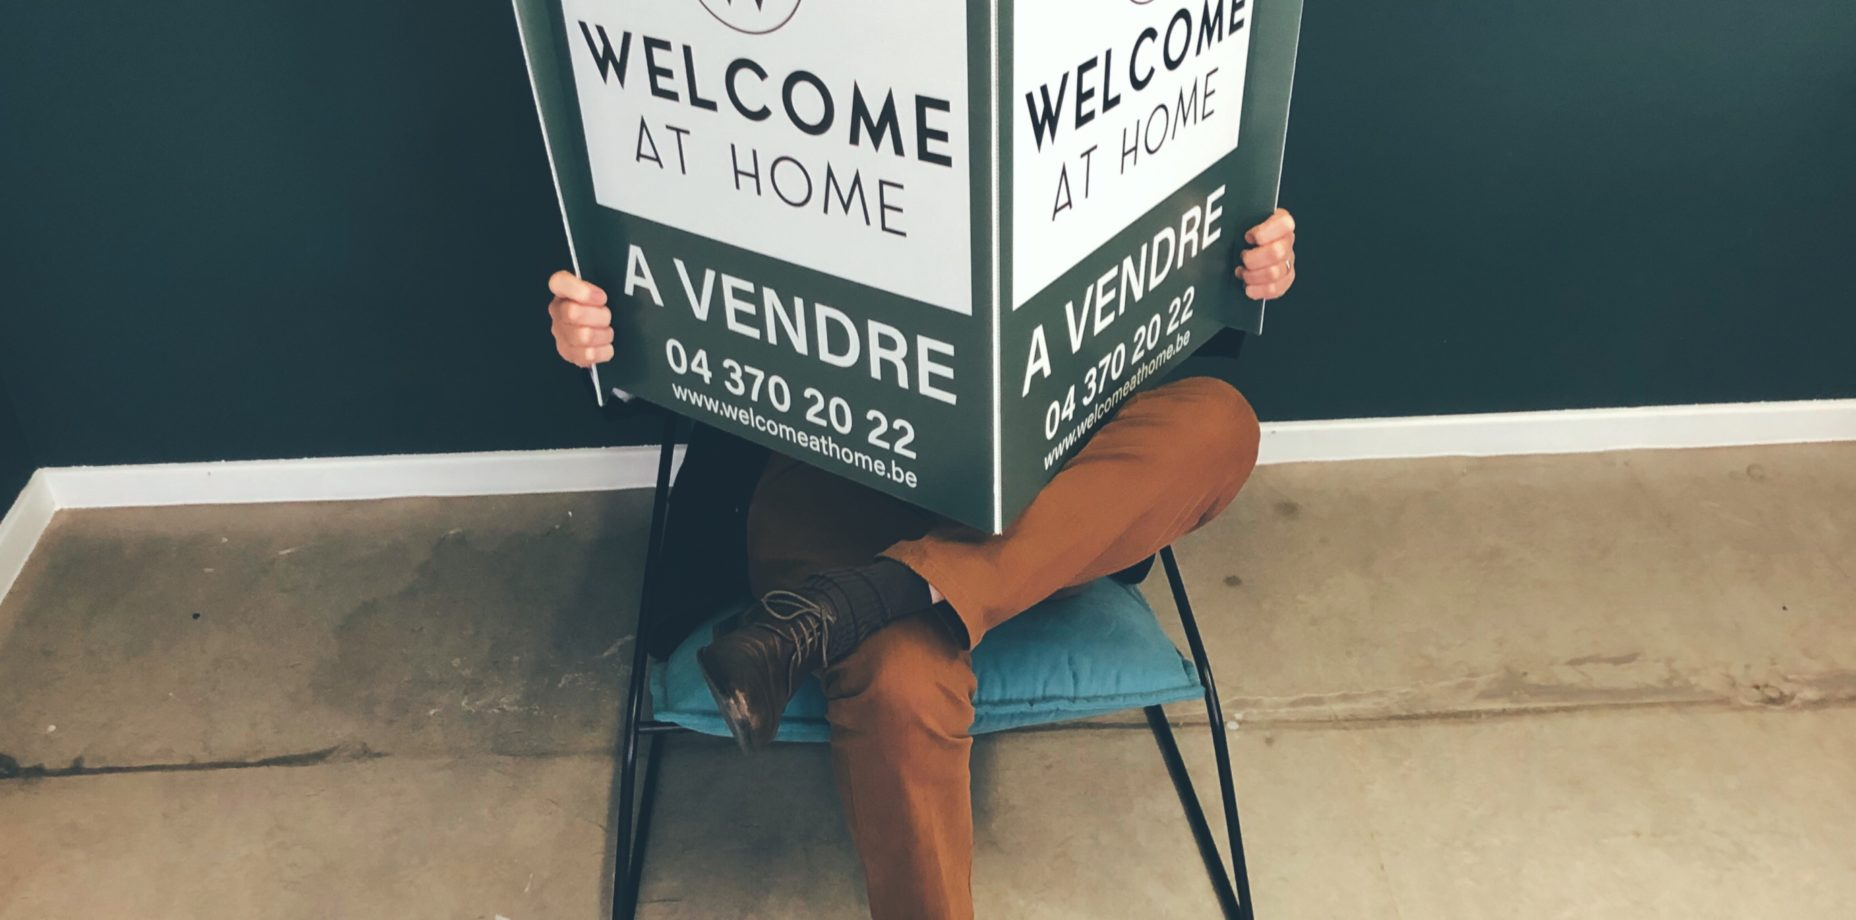 Welcome At Home, agence immobilière à Liège - A propos : vente immobilière